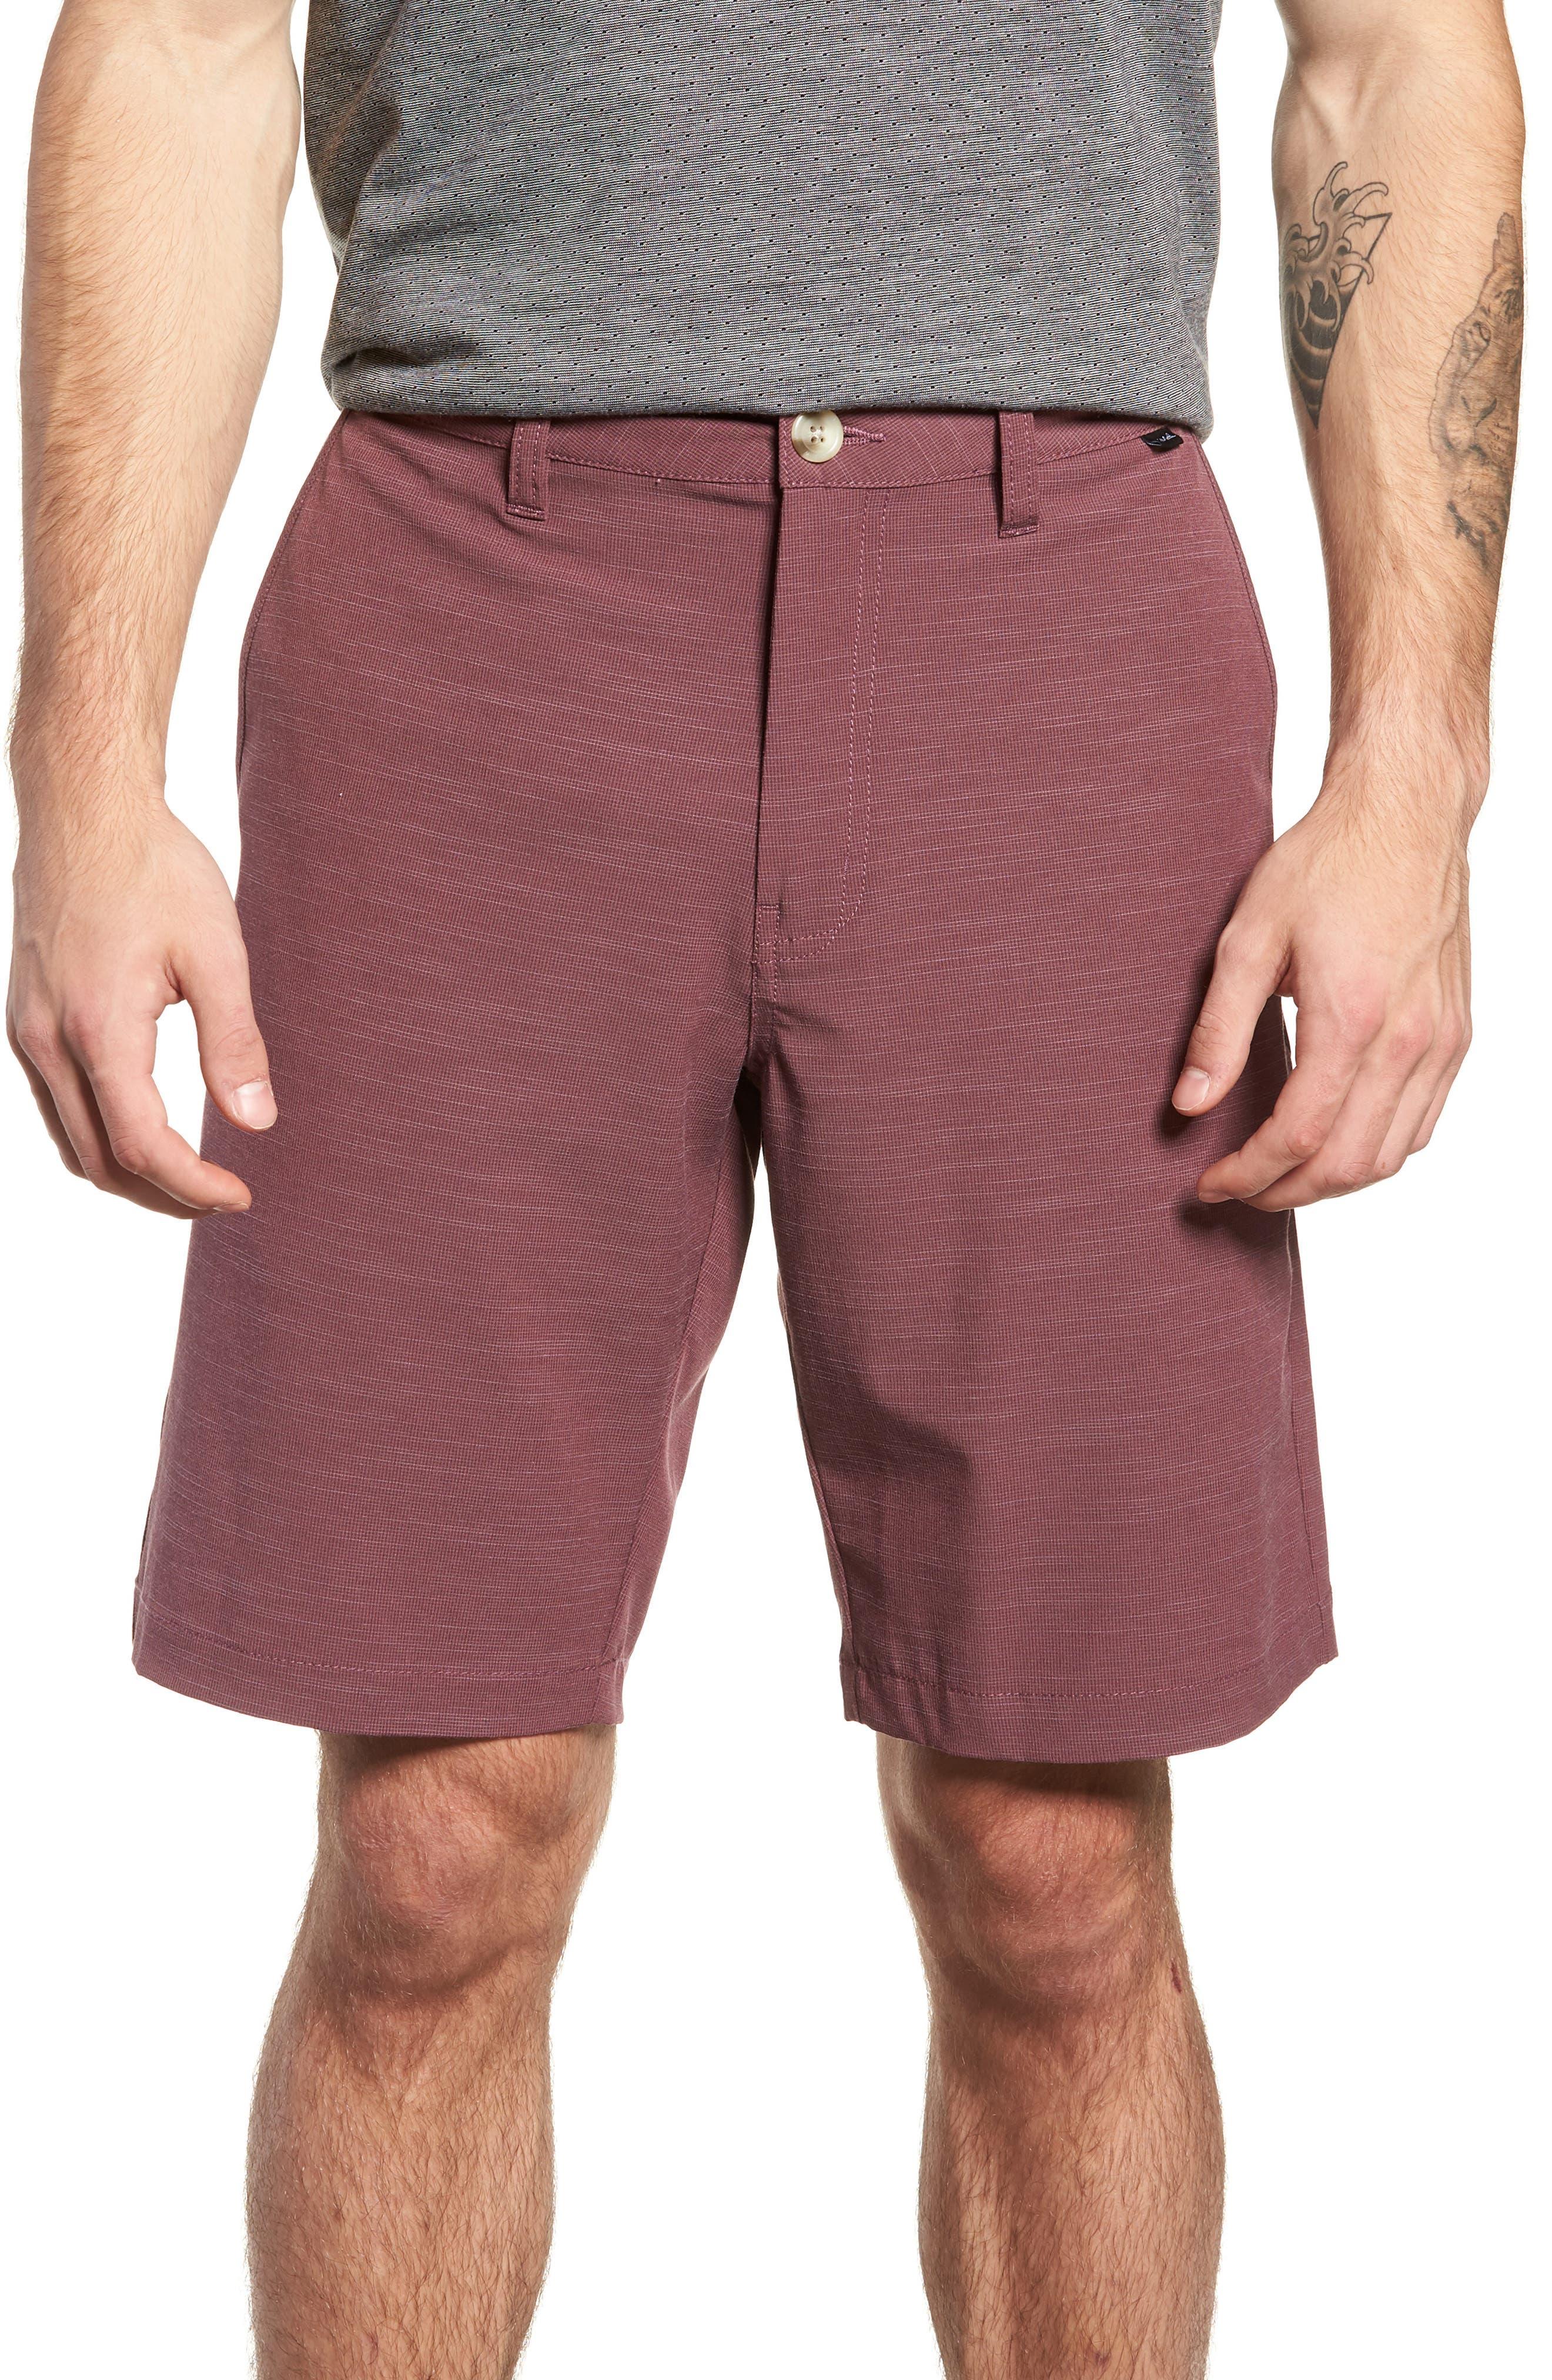 Tuner Shorts,                         Main,                         color, EGGPLANT